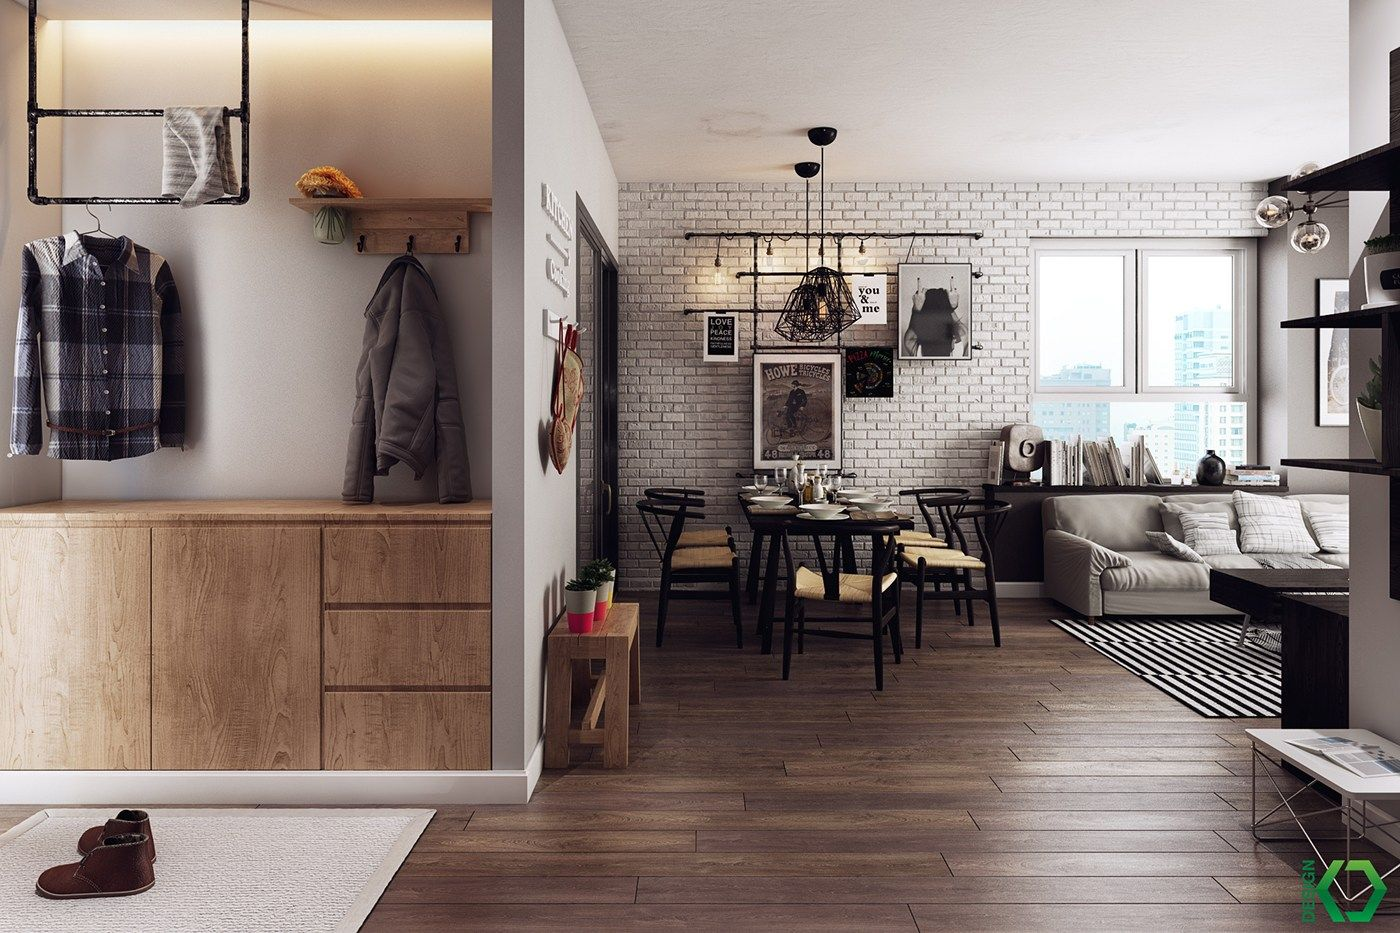 A Charming Nordic Apartment Interior Design by Koj Design Nordic